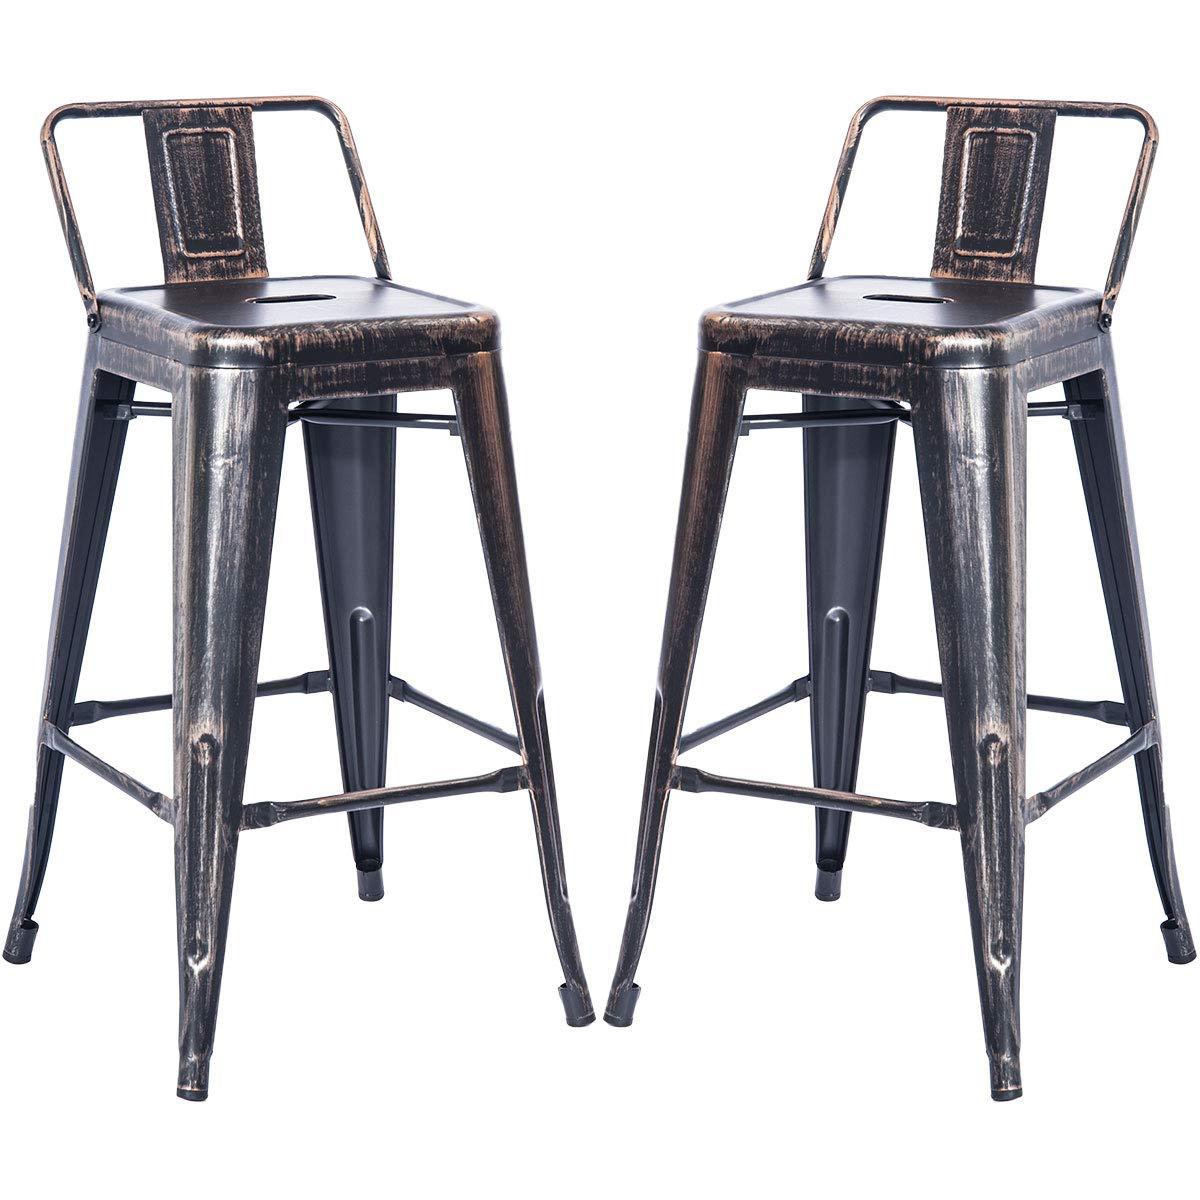 Lovedfull Metal Counter Stool Metal Chair Barstool Set of 2 (Golden Black)